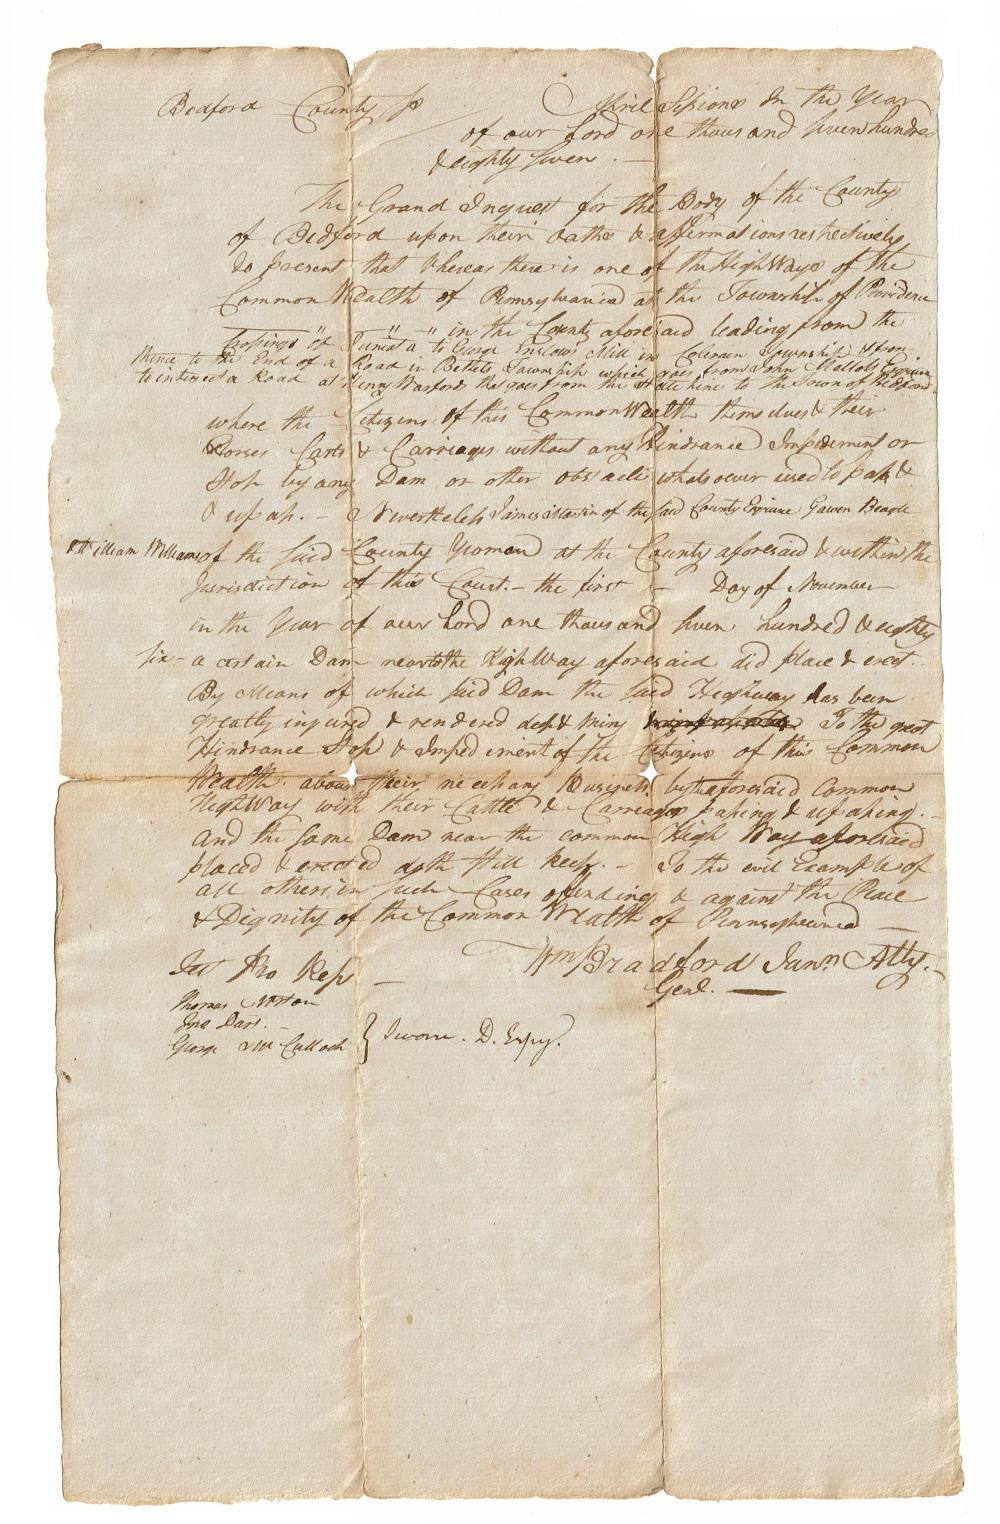 G. Washington's Atty Gen, Col. Wm. Bradford 1787 MDS